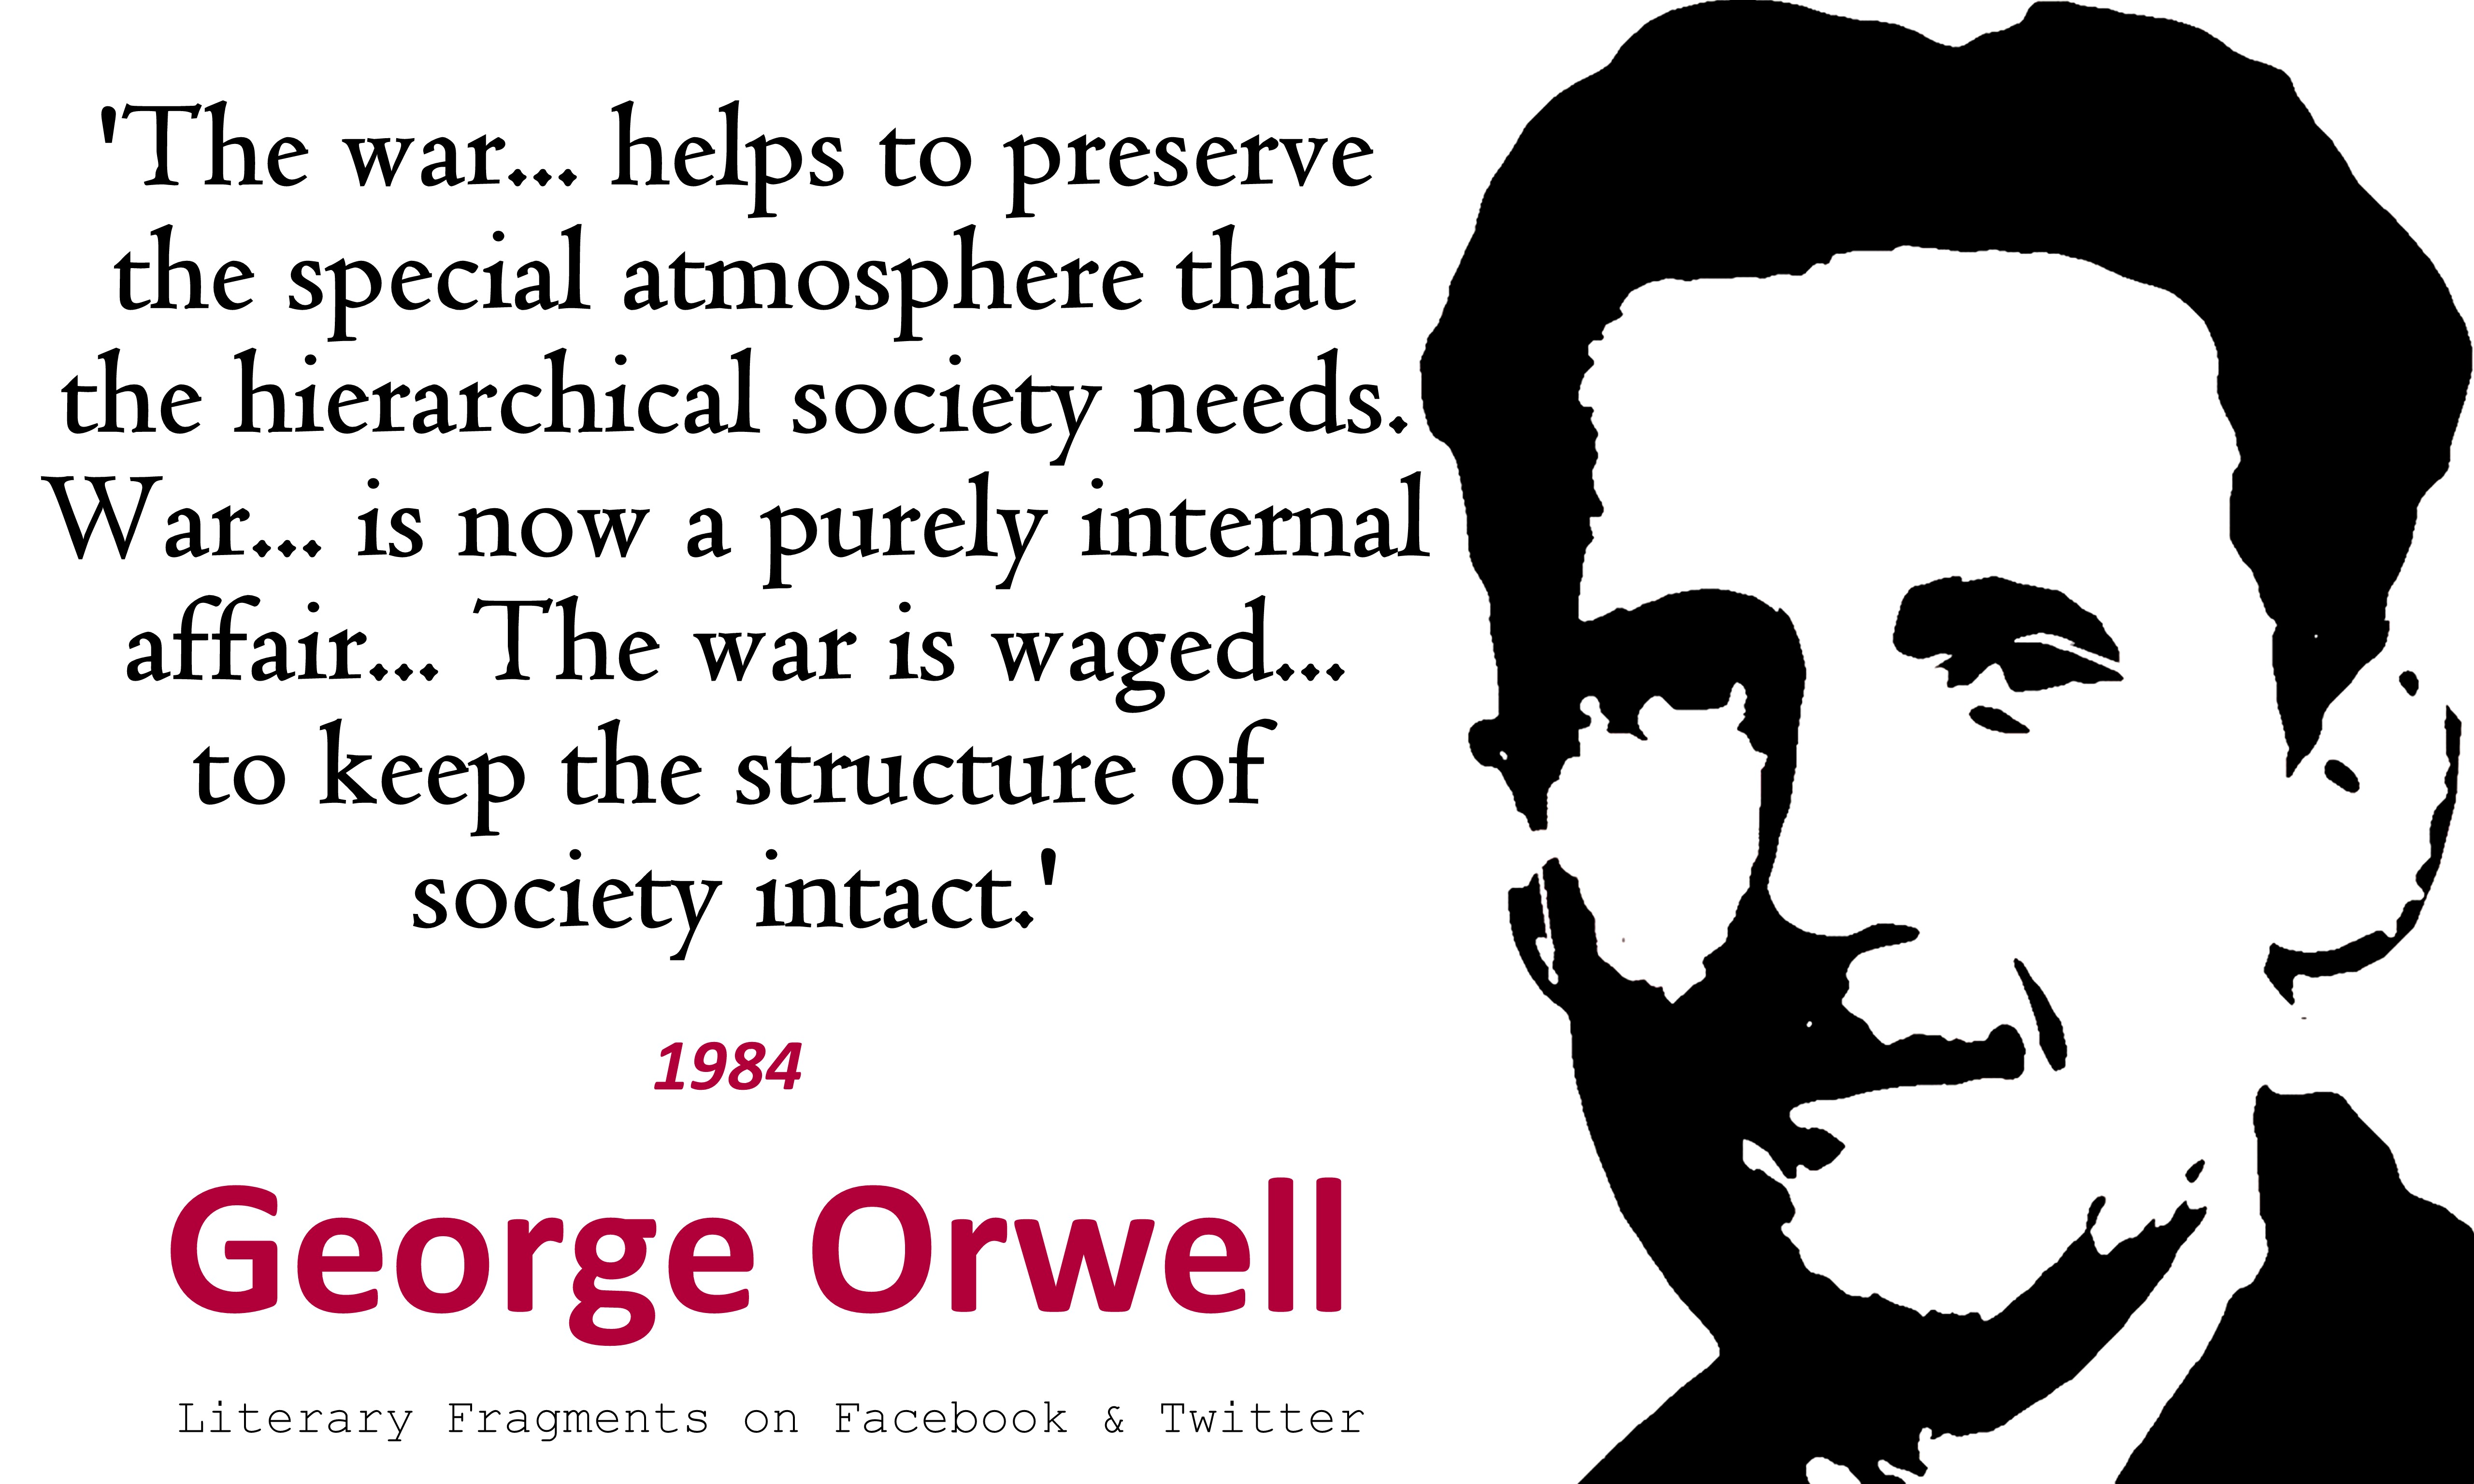 George orwell 1984 indiziert 2011